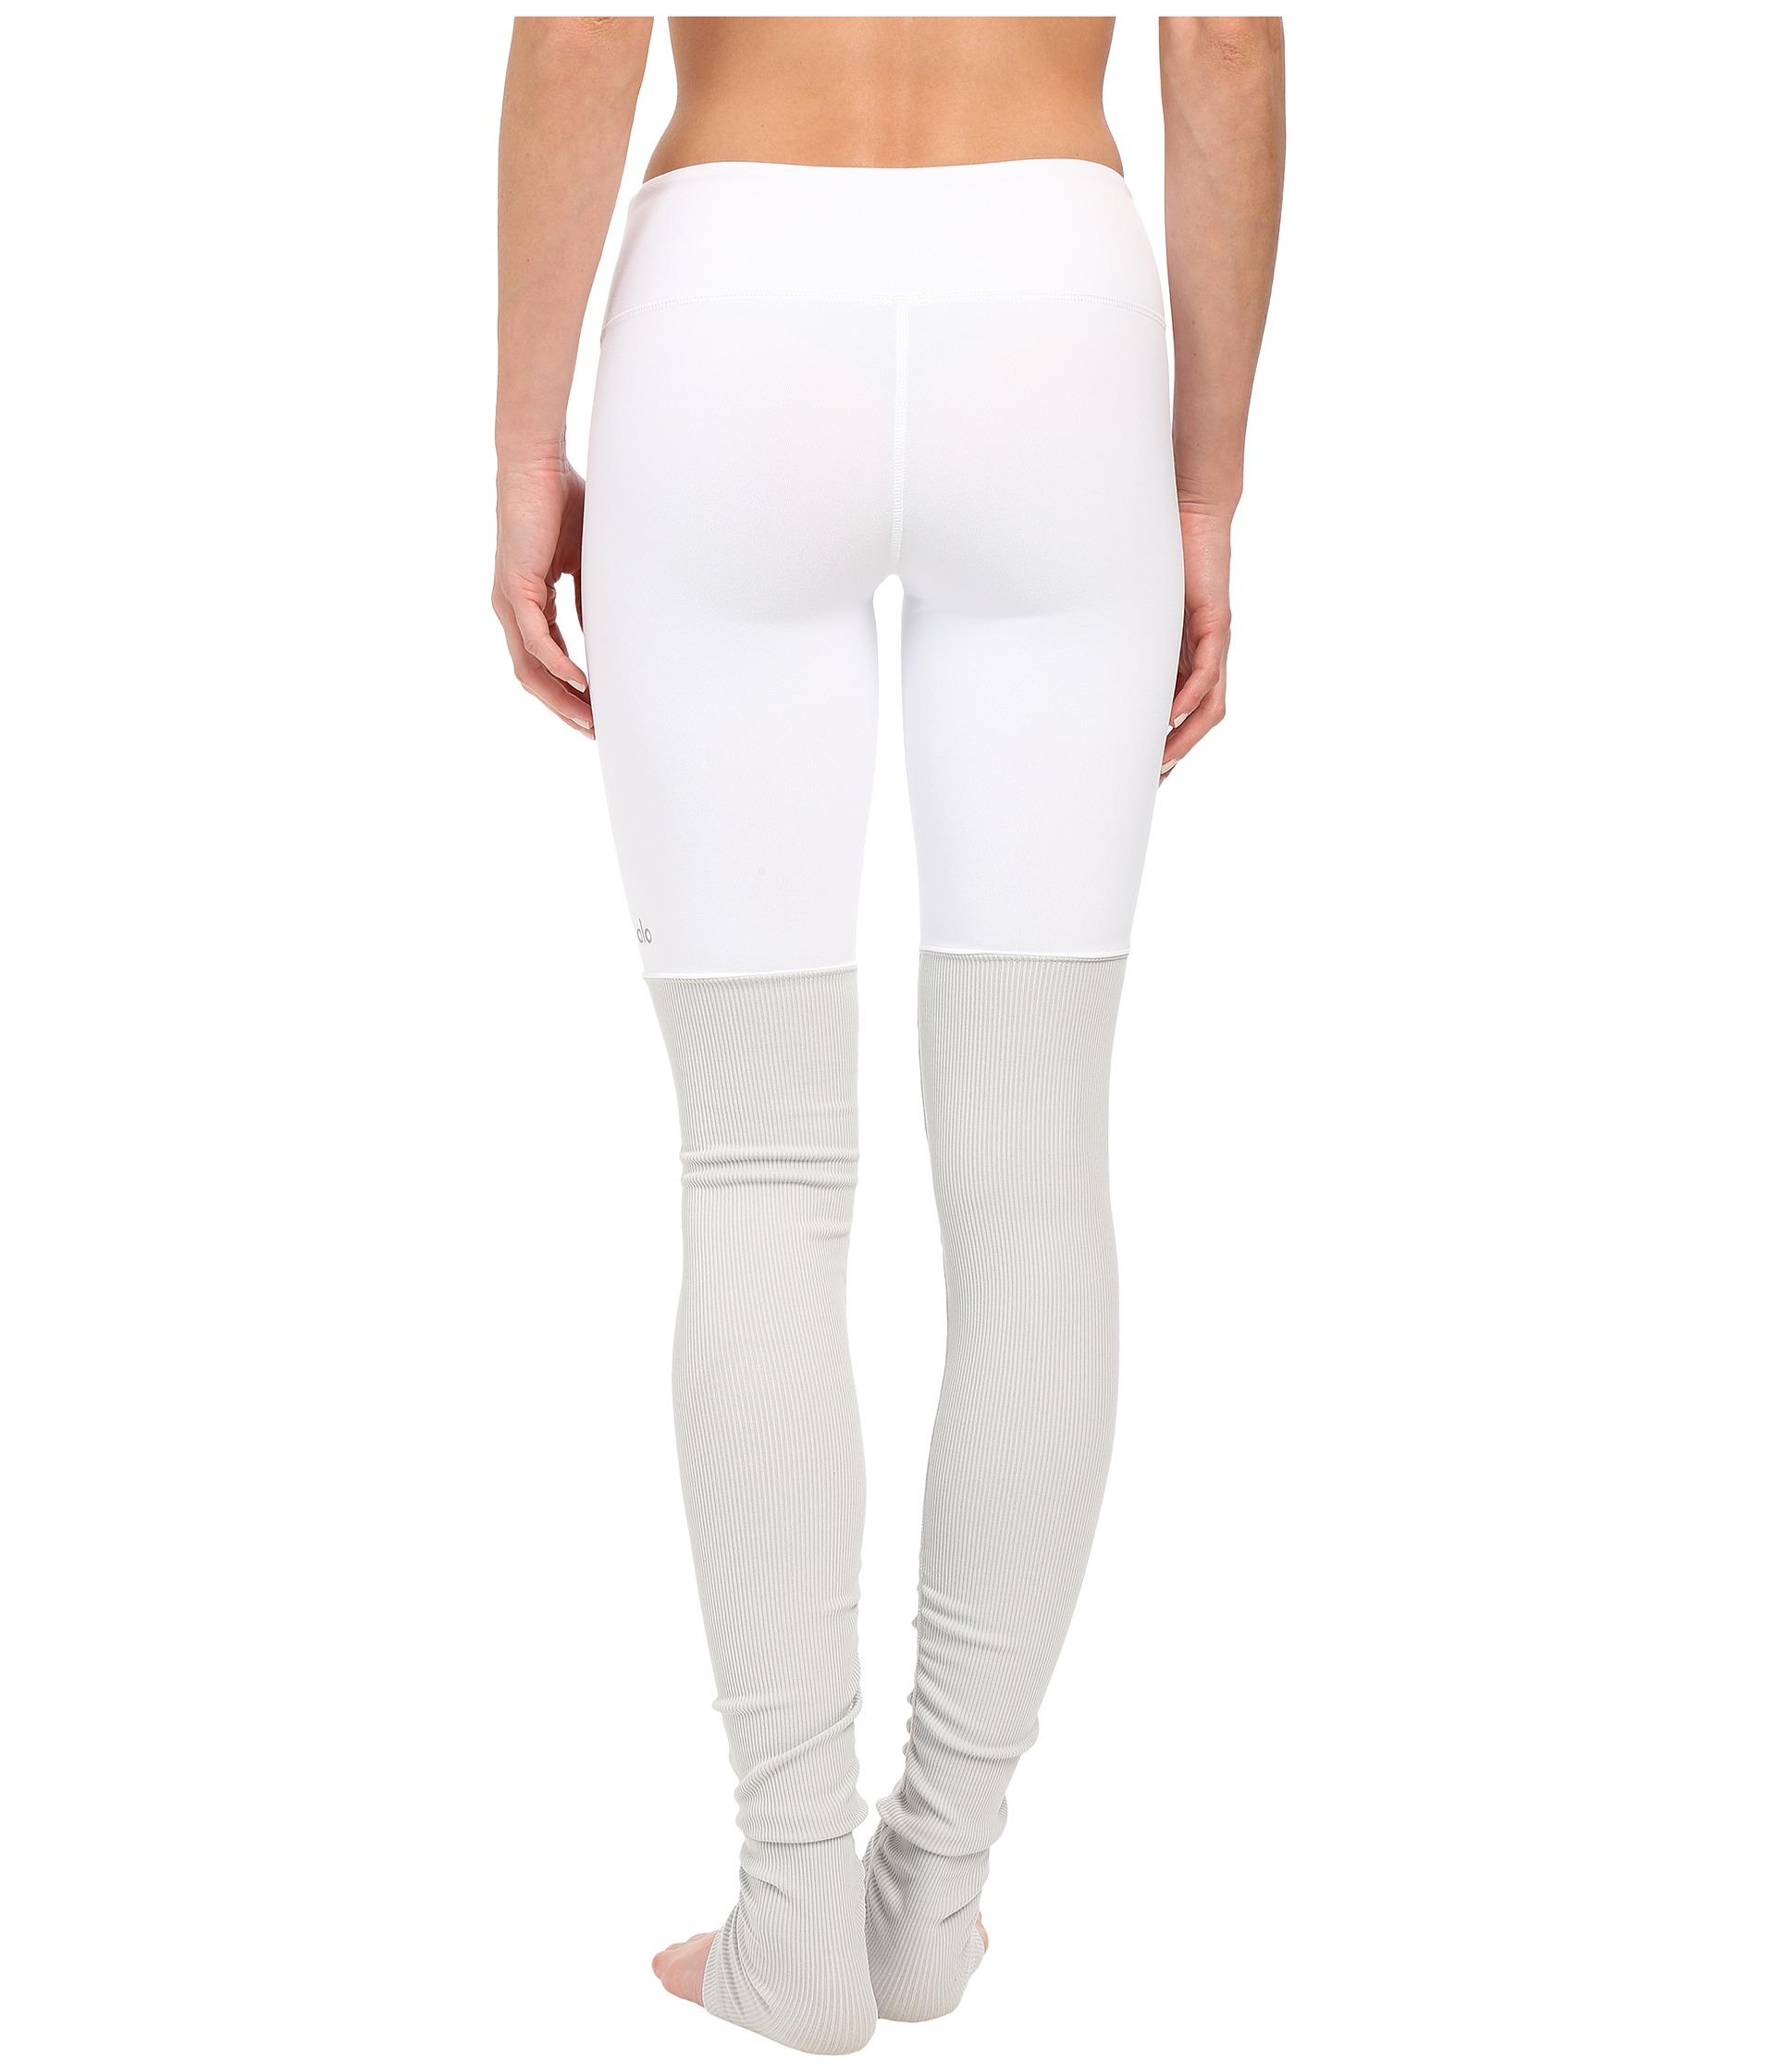 84a03e4f09ae7c Alo Yoga Goddess Ribbed Legging in White - Lyst